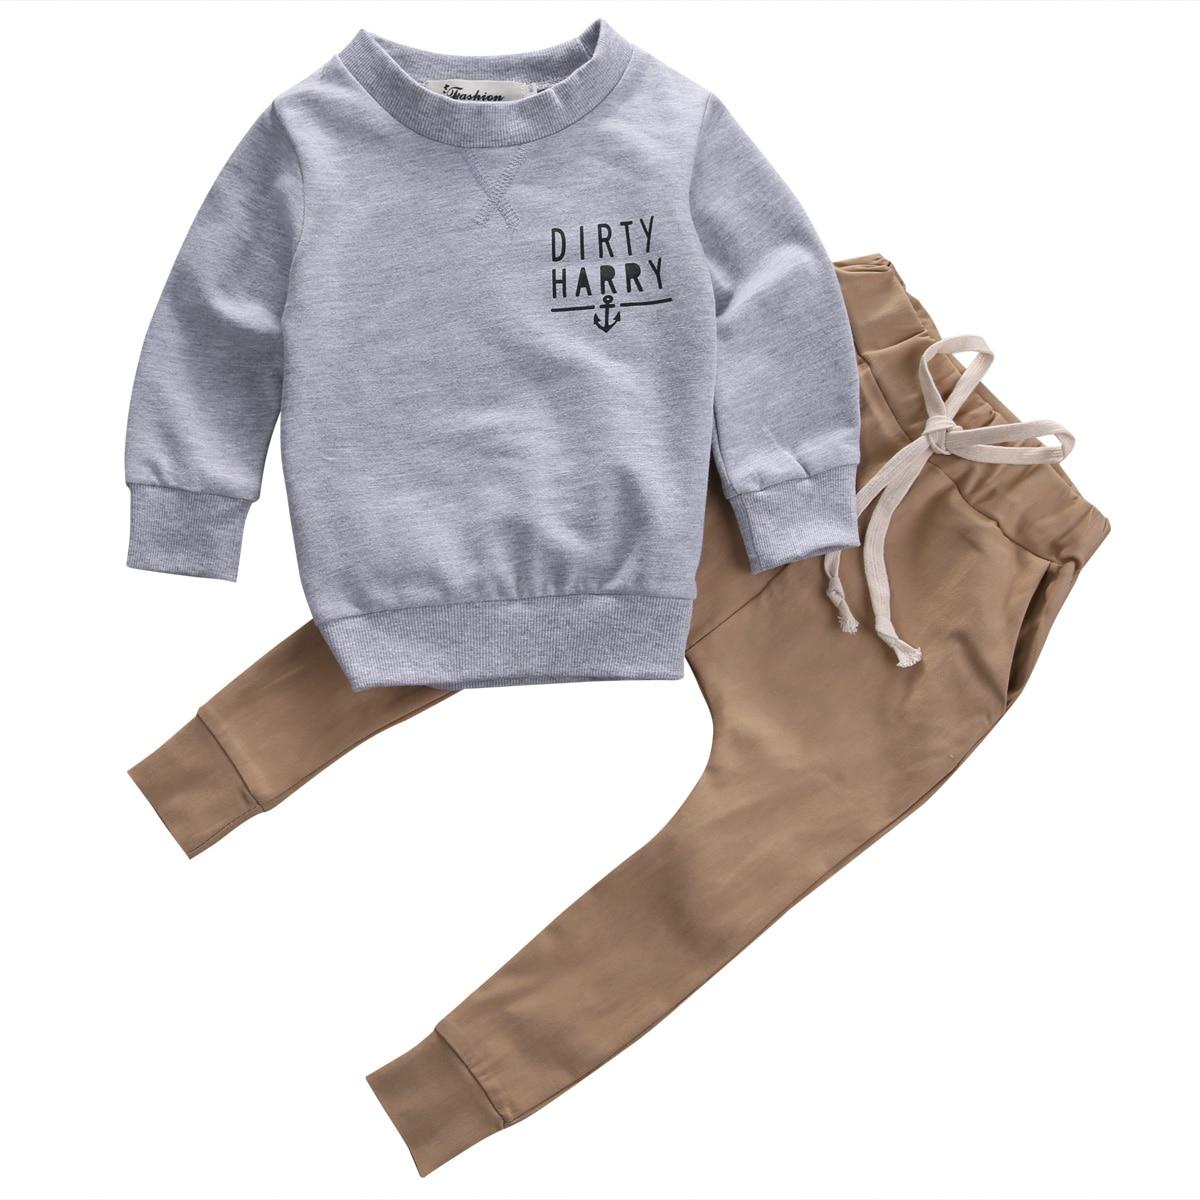 2pcs Newborn Infant Baby Kids Autumn Winter Outfits Babies